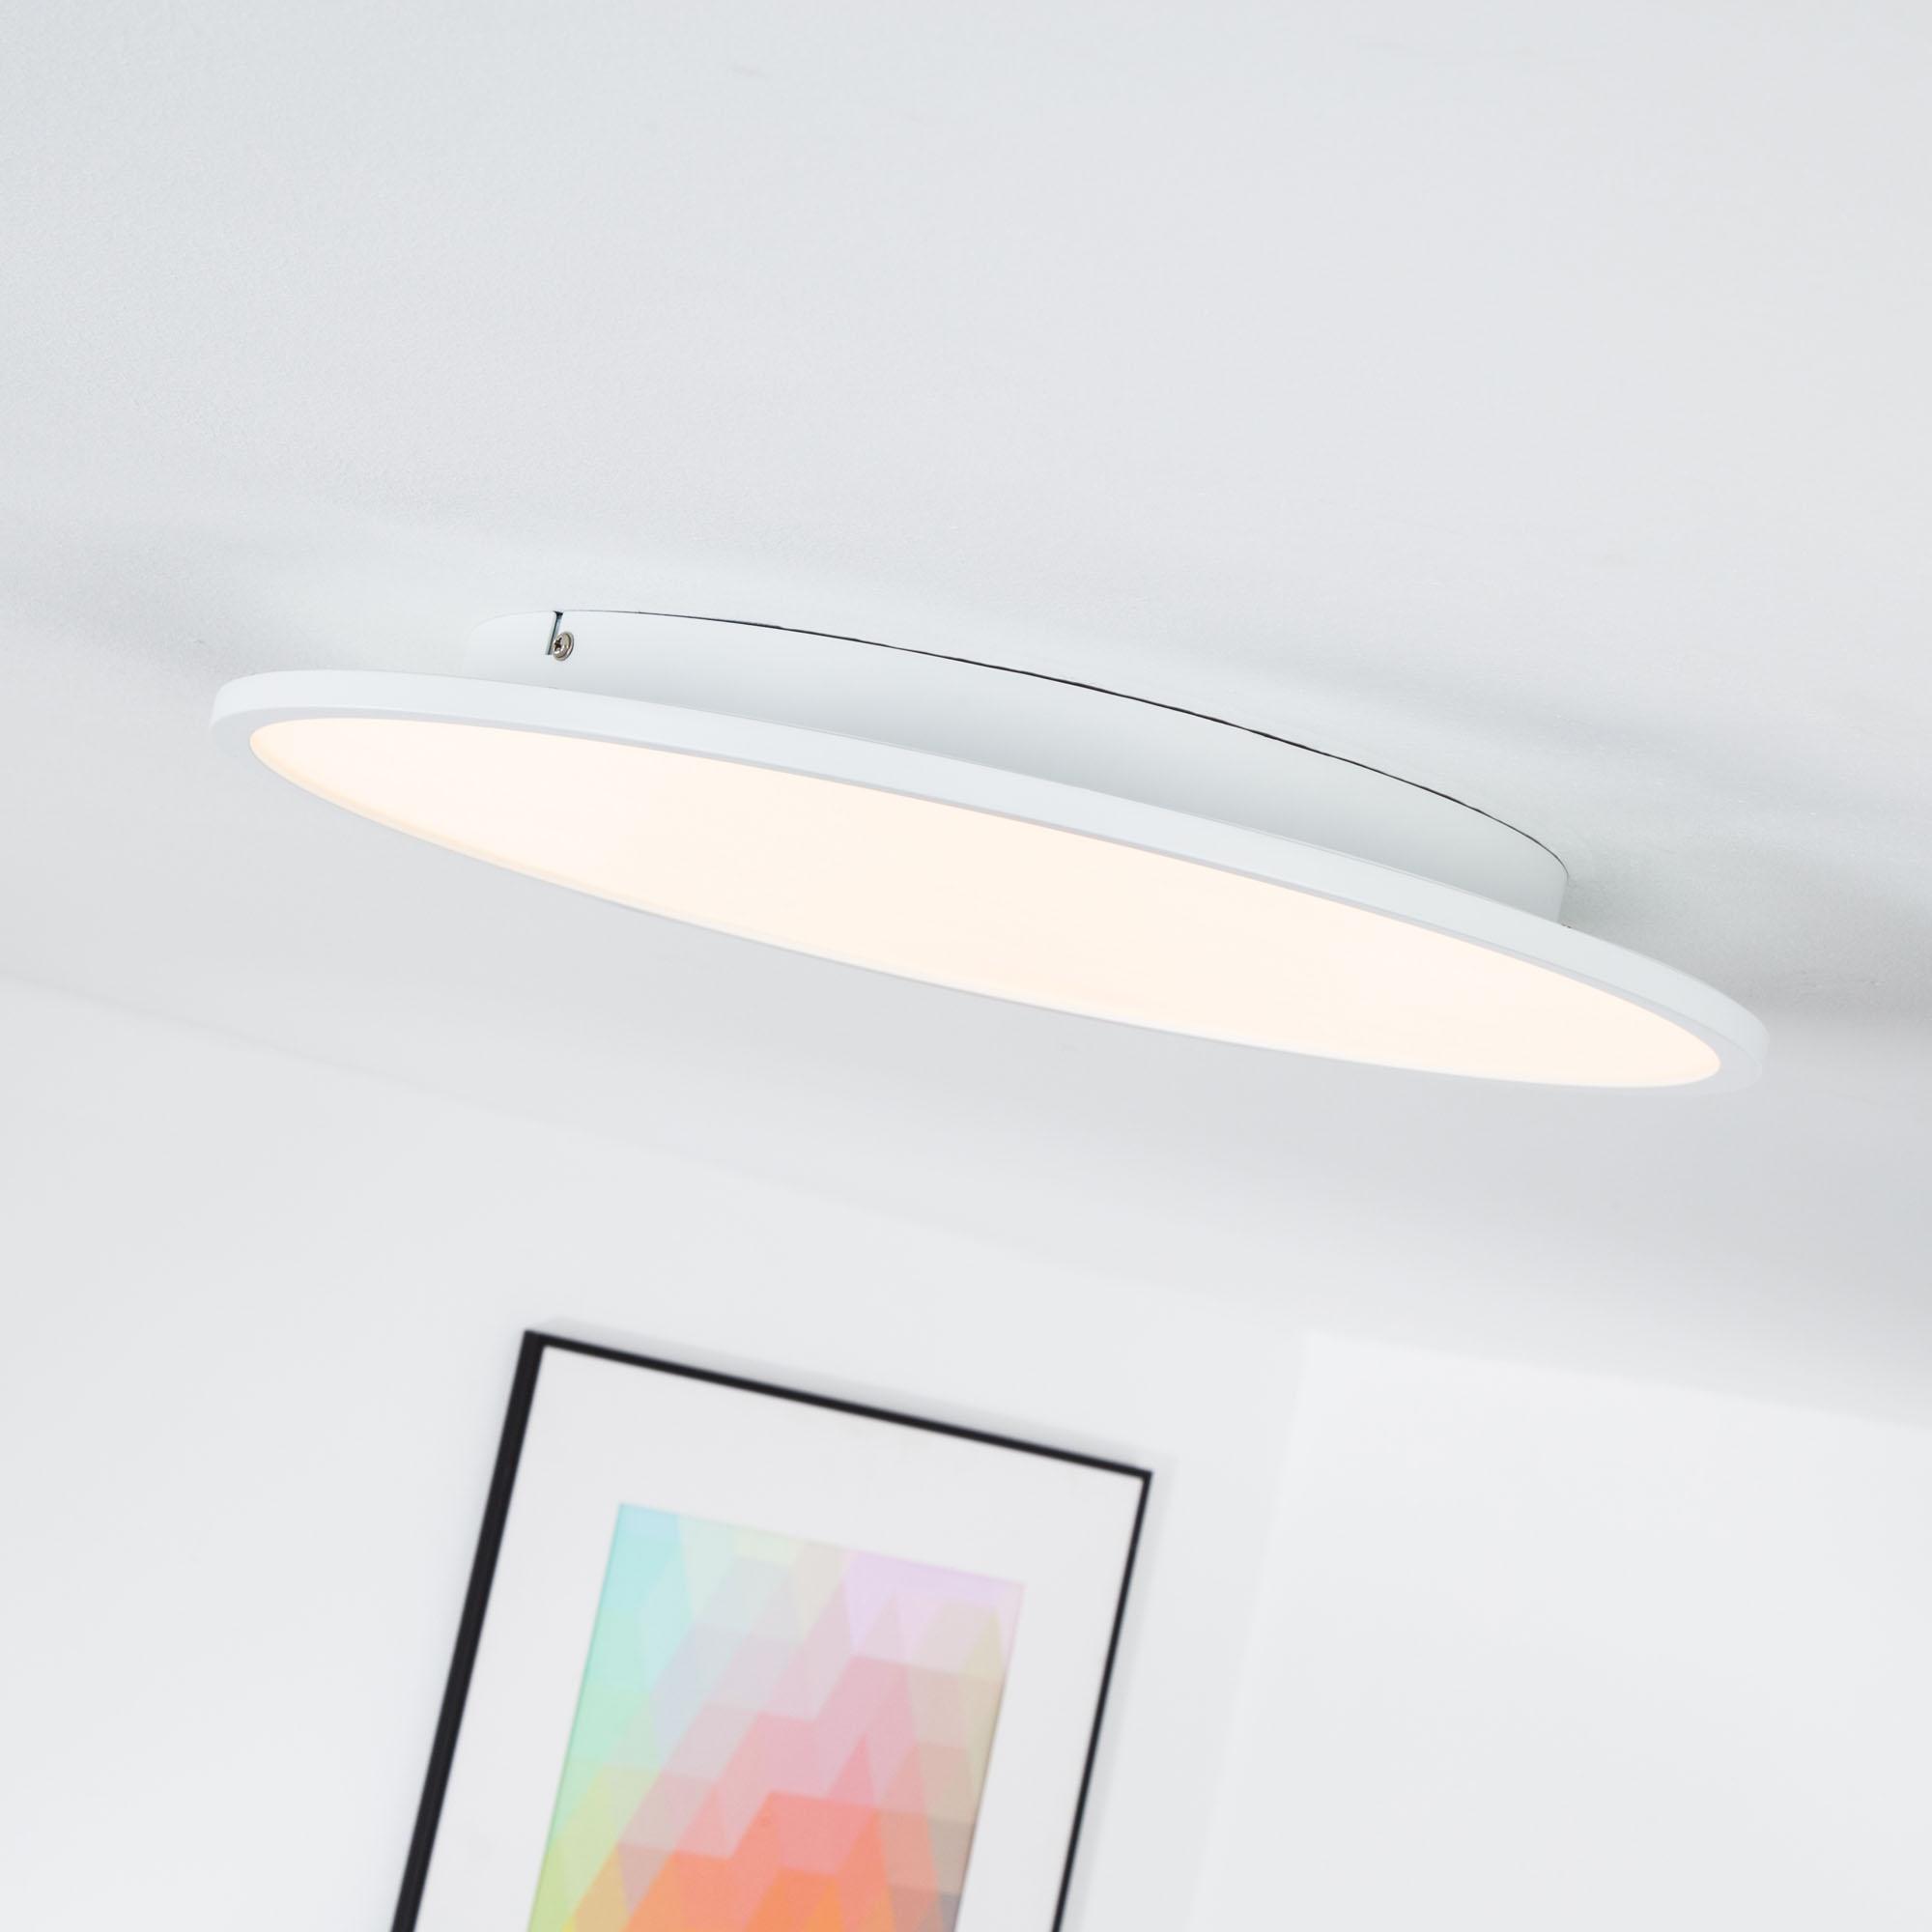 led panel f r deckenaufbau dimmbar 45 cm rund 1x 30w led integriert 3000 lumen 3000k. Black Bedroom Furniture Sets. Home Design Ideas